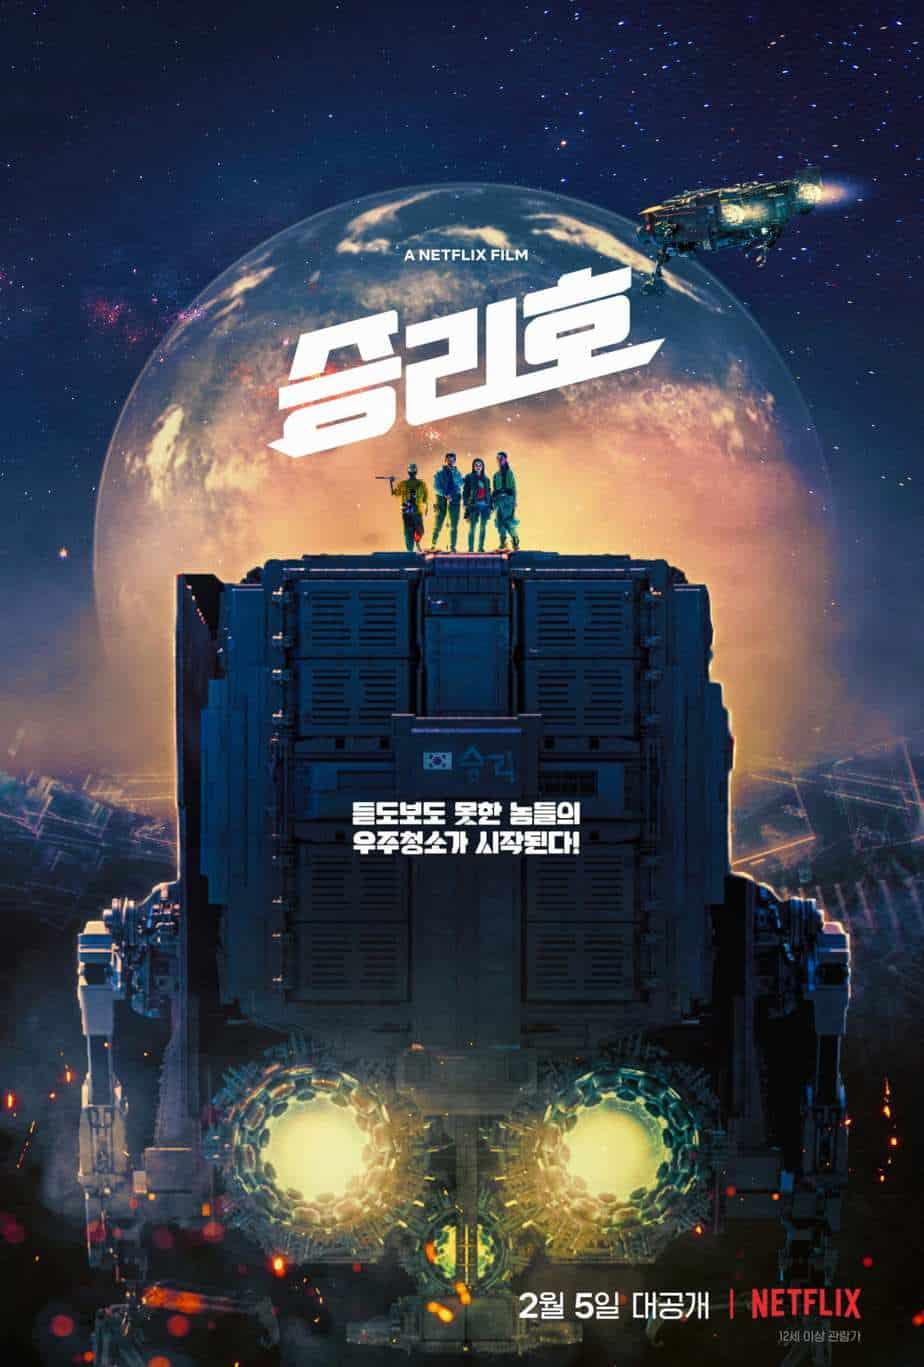 Netflix annonce la date de sortie de Space Sweepers